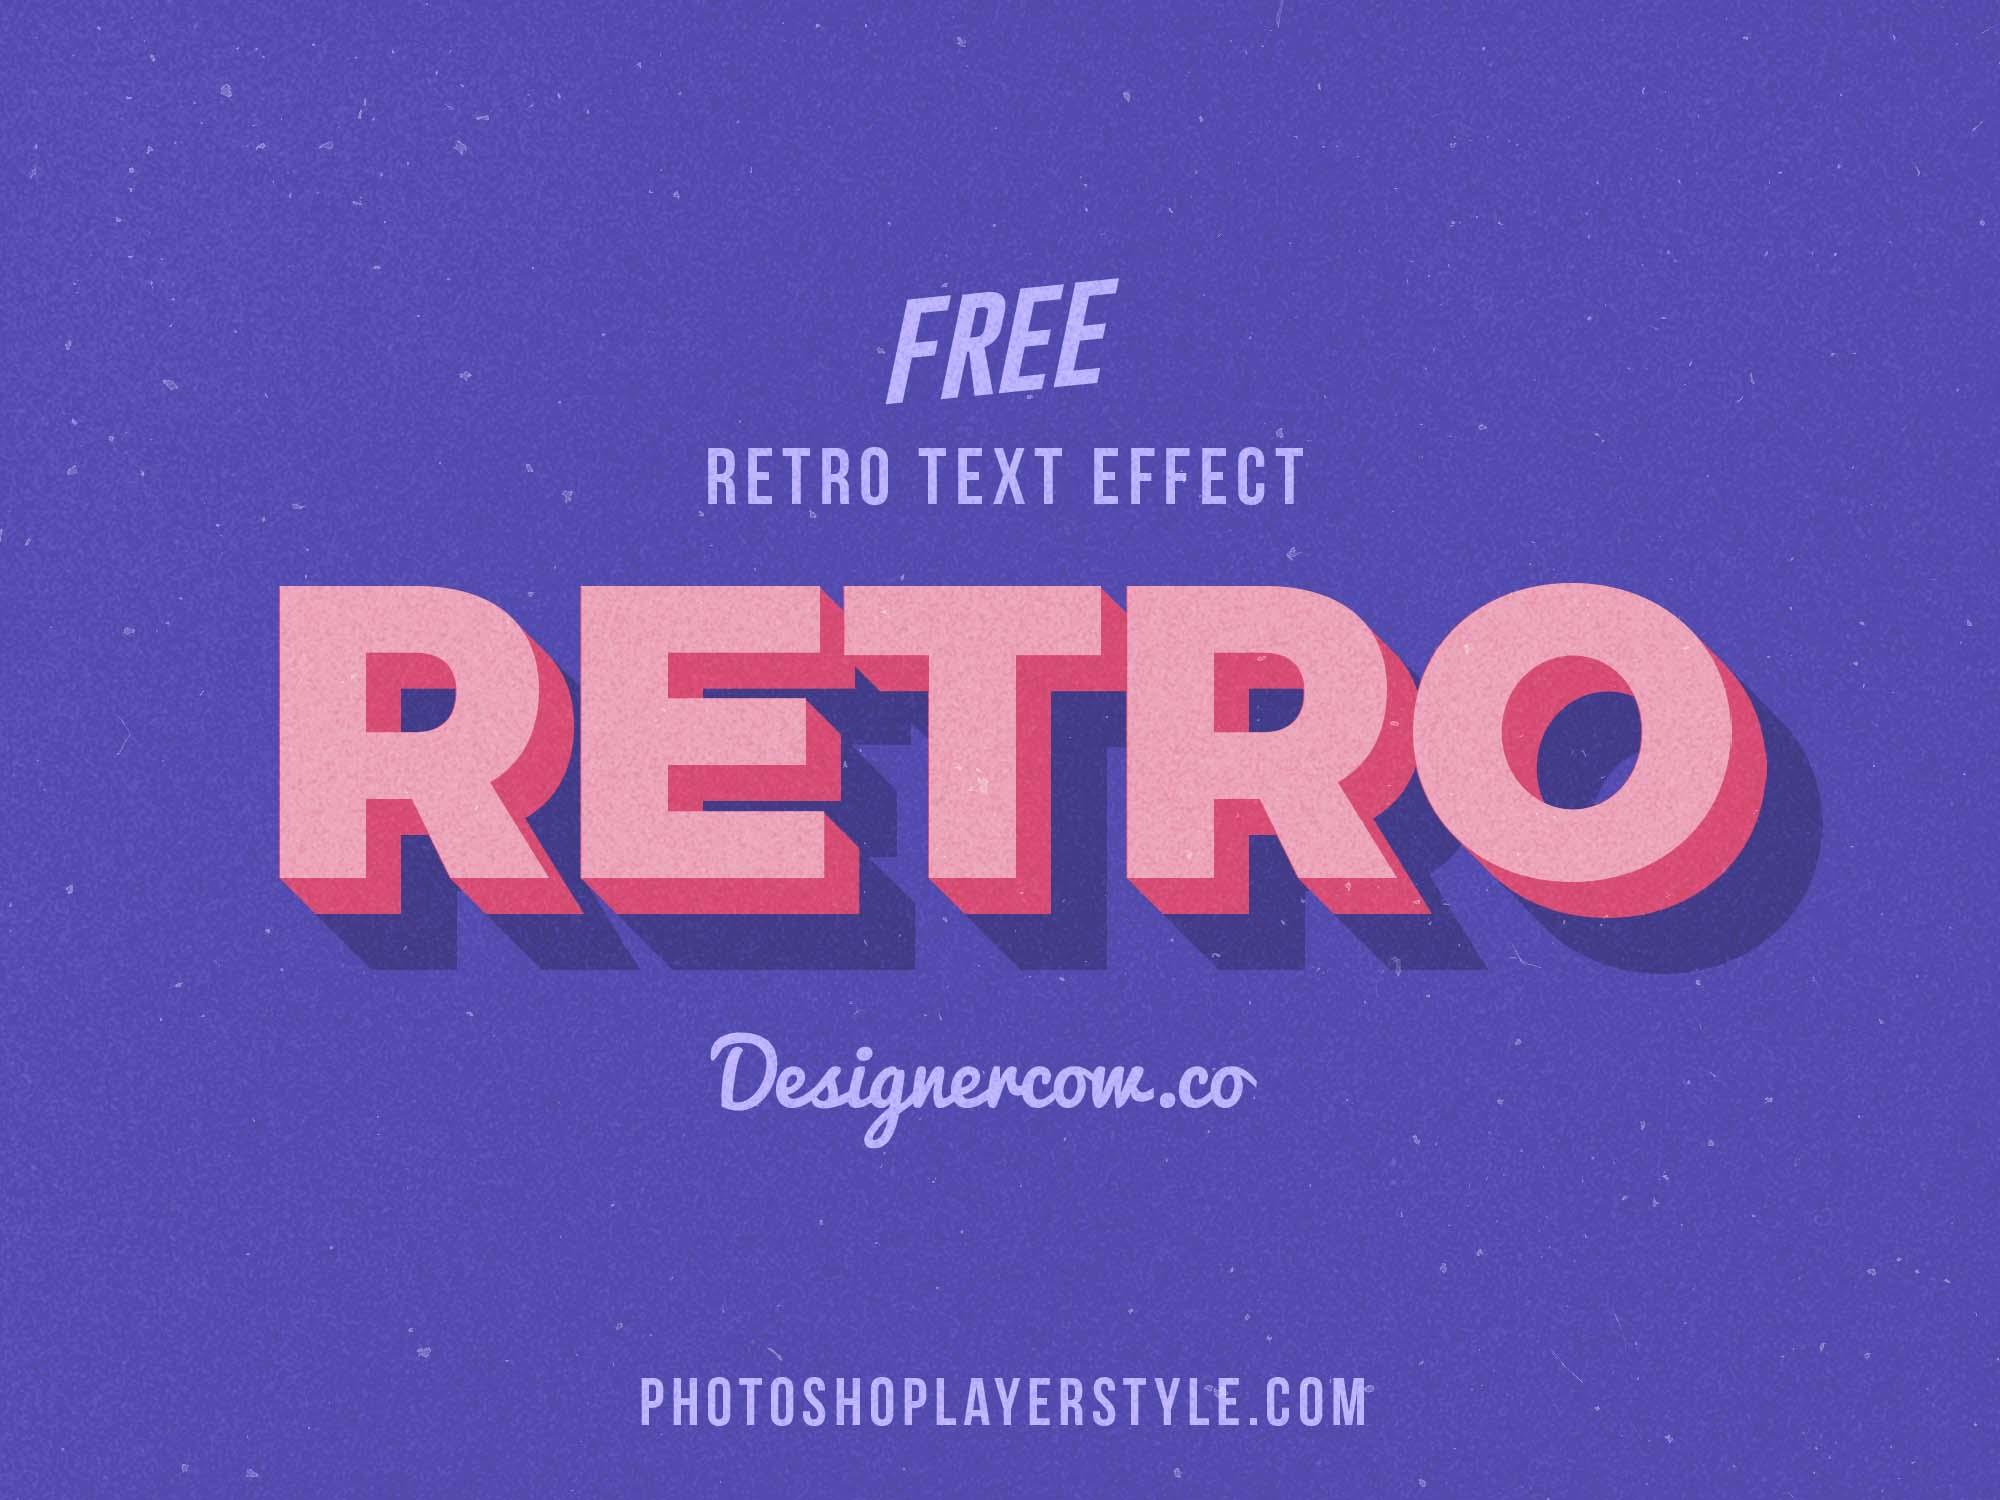 Free Retro 3D Text Effect